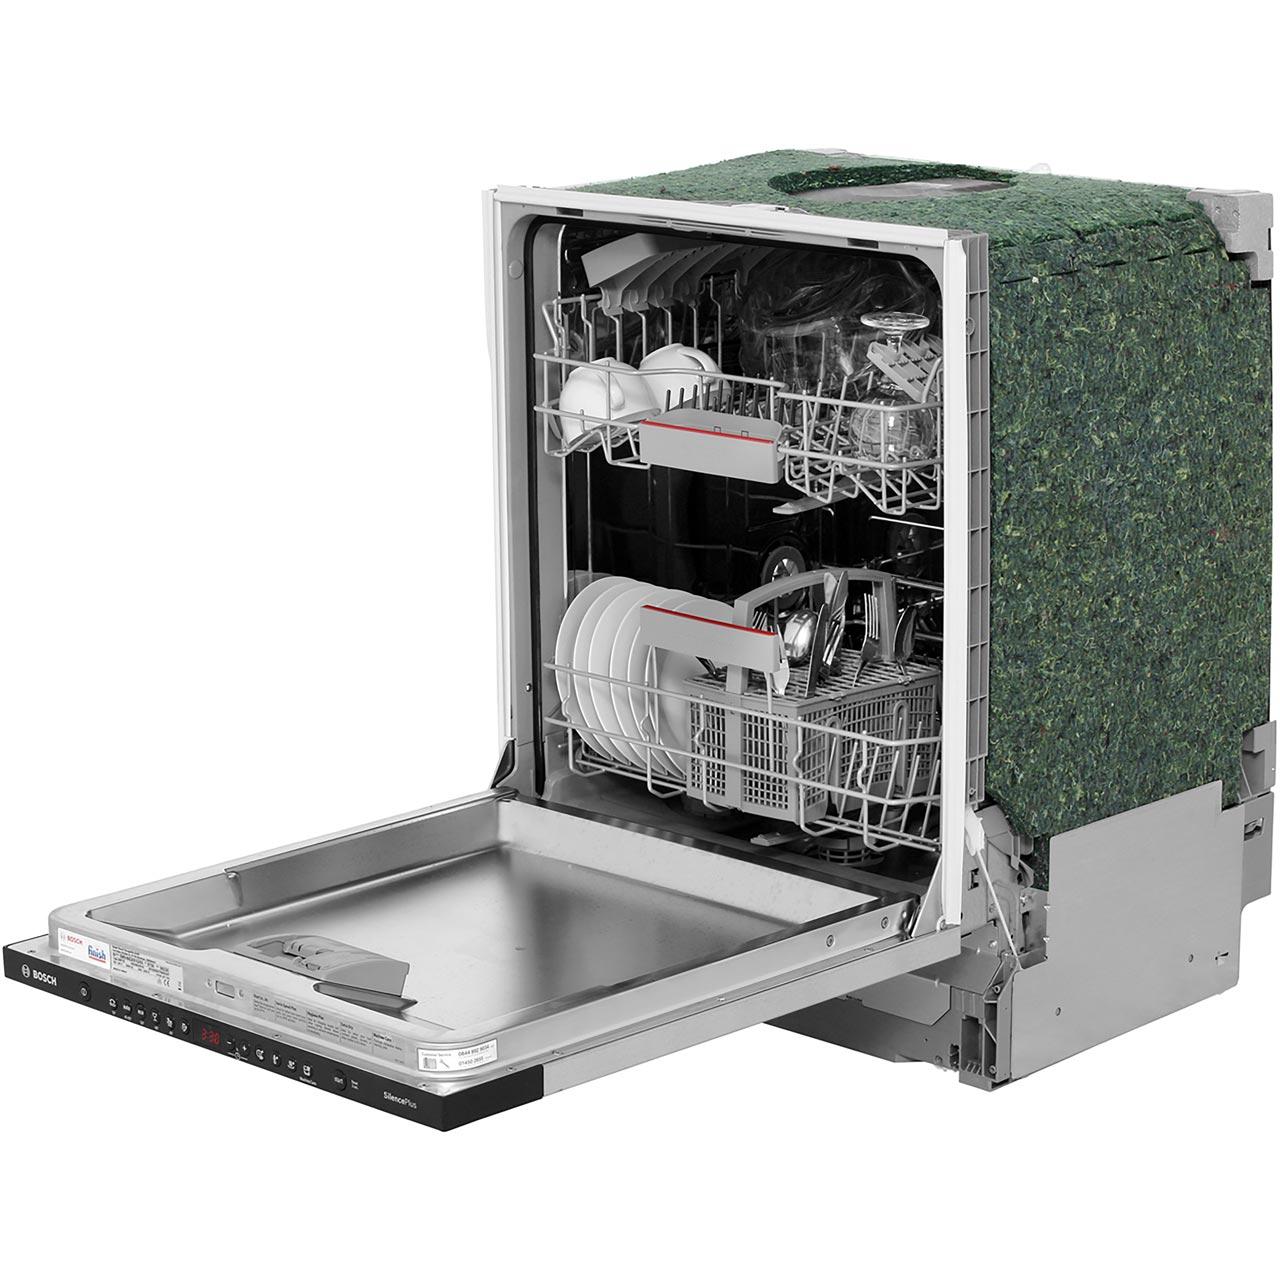 Bosch Serie 4 Smv46gx01g Built In Standard Dishwasher Black